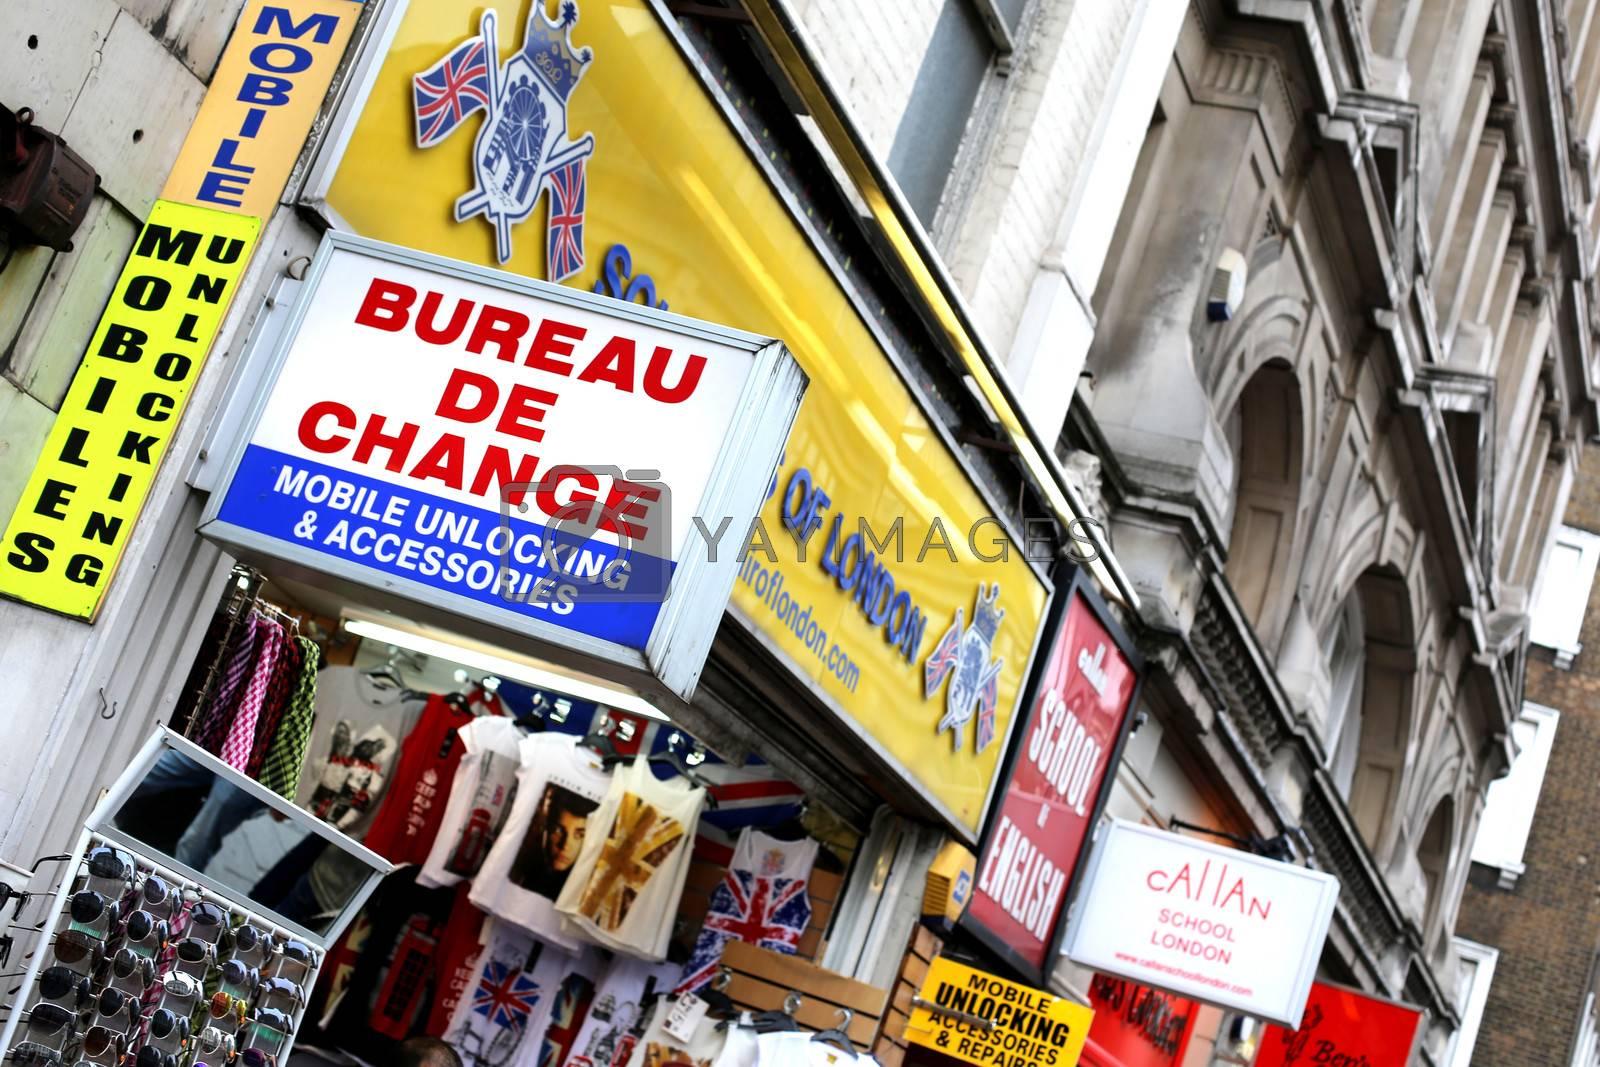 Bureau De Change Oxford Street London by Whiteboxmedia